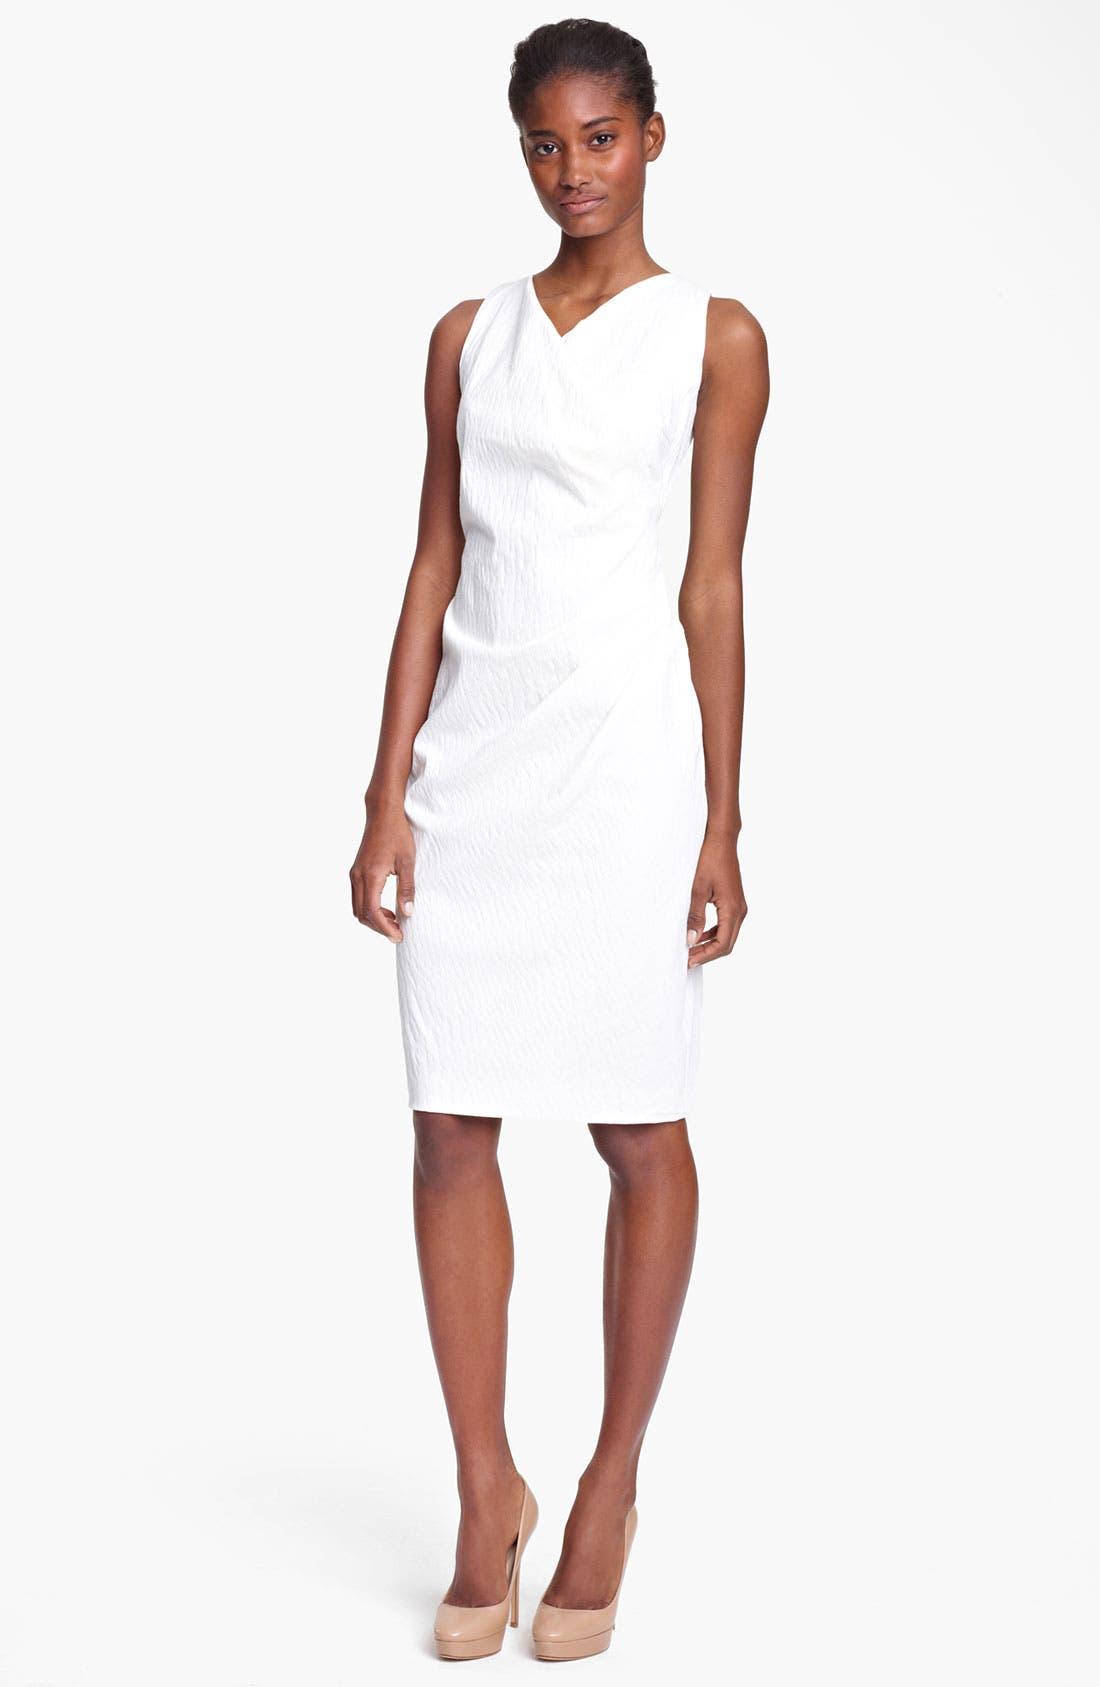 Alternate Image 1 Selected - Max Mara Draped Stretch Jacquard Dress